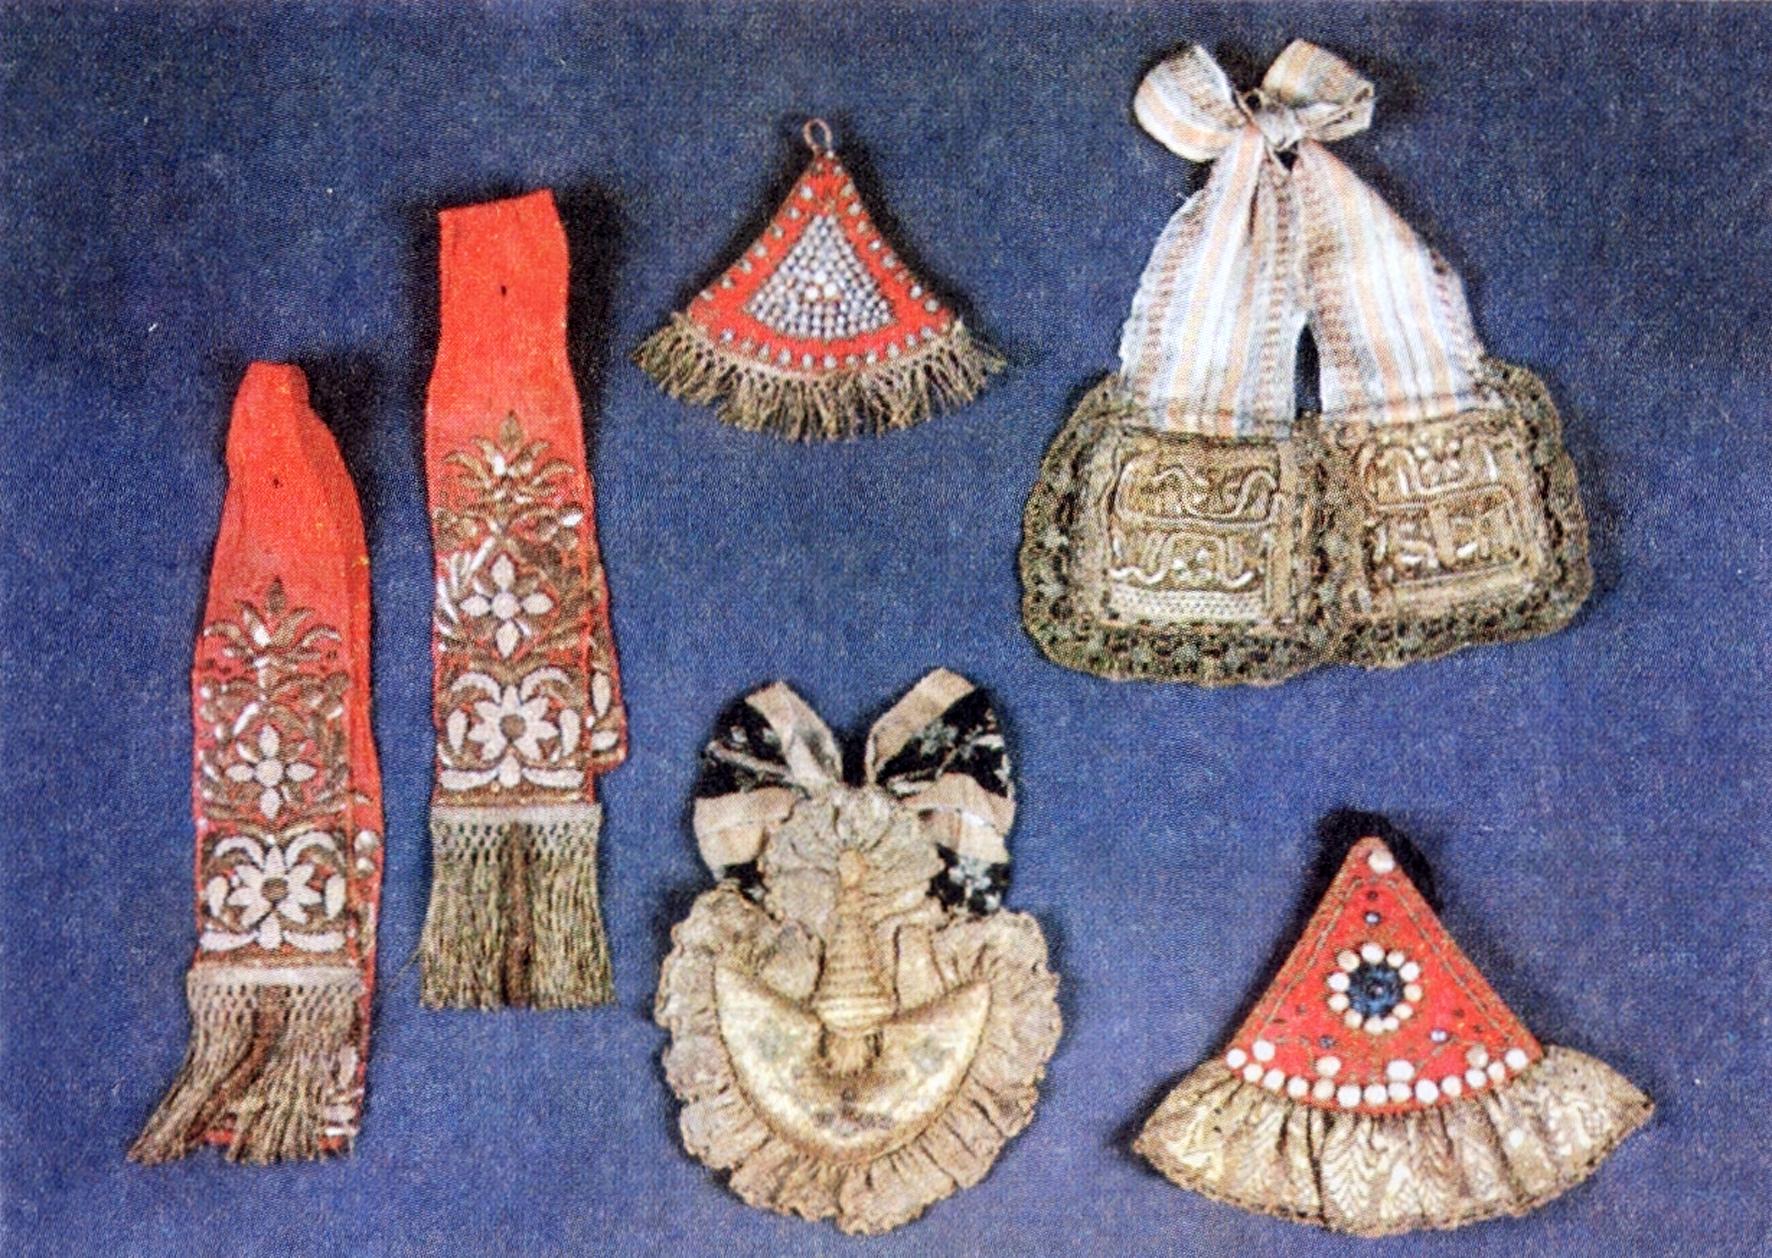 http://www.booksite.ru/trade_vologda/picture/4_63.jpg